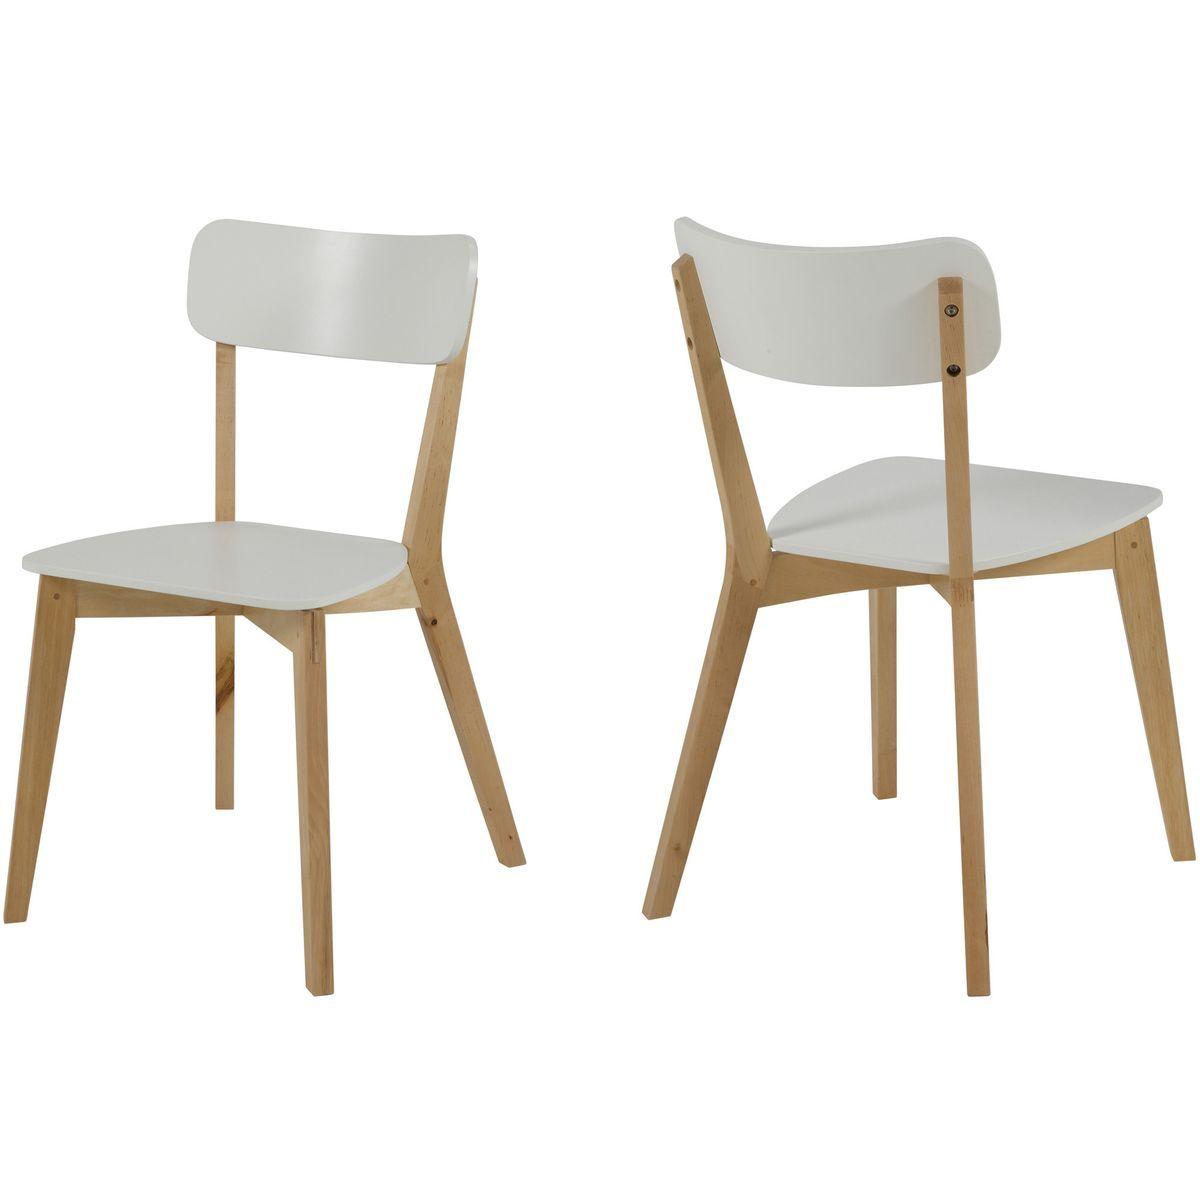 Chaises Moderne Laquee Blanc Luza Lot De 2 Chaise Moderne Chaise Et Table Salle A Manger